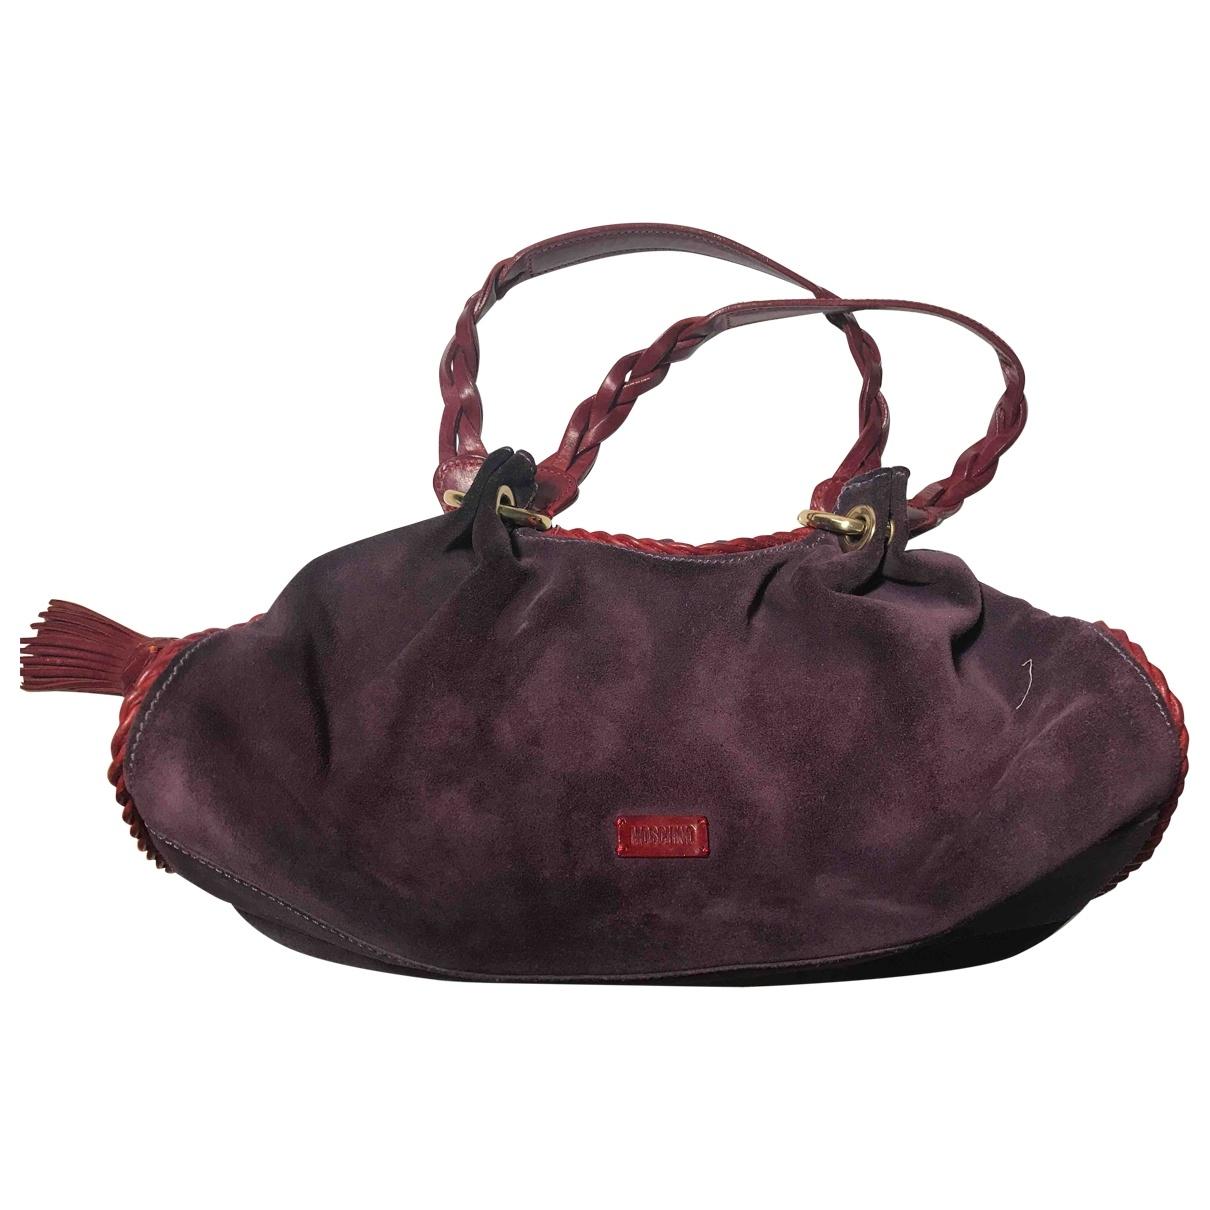 Moschino \N Purple Suede handbag for Women \N